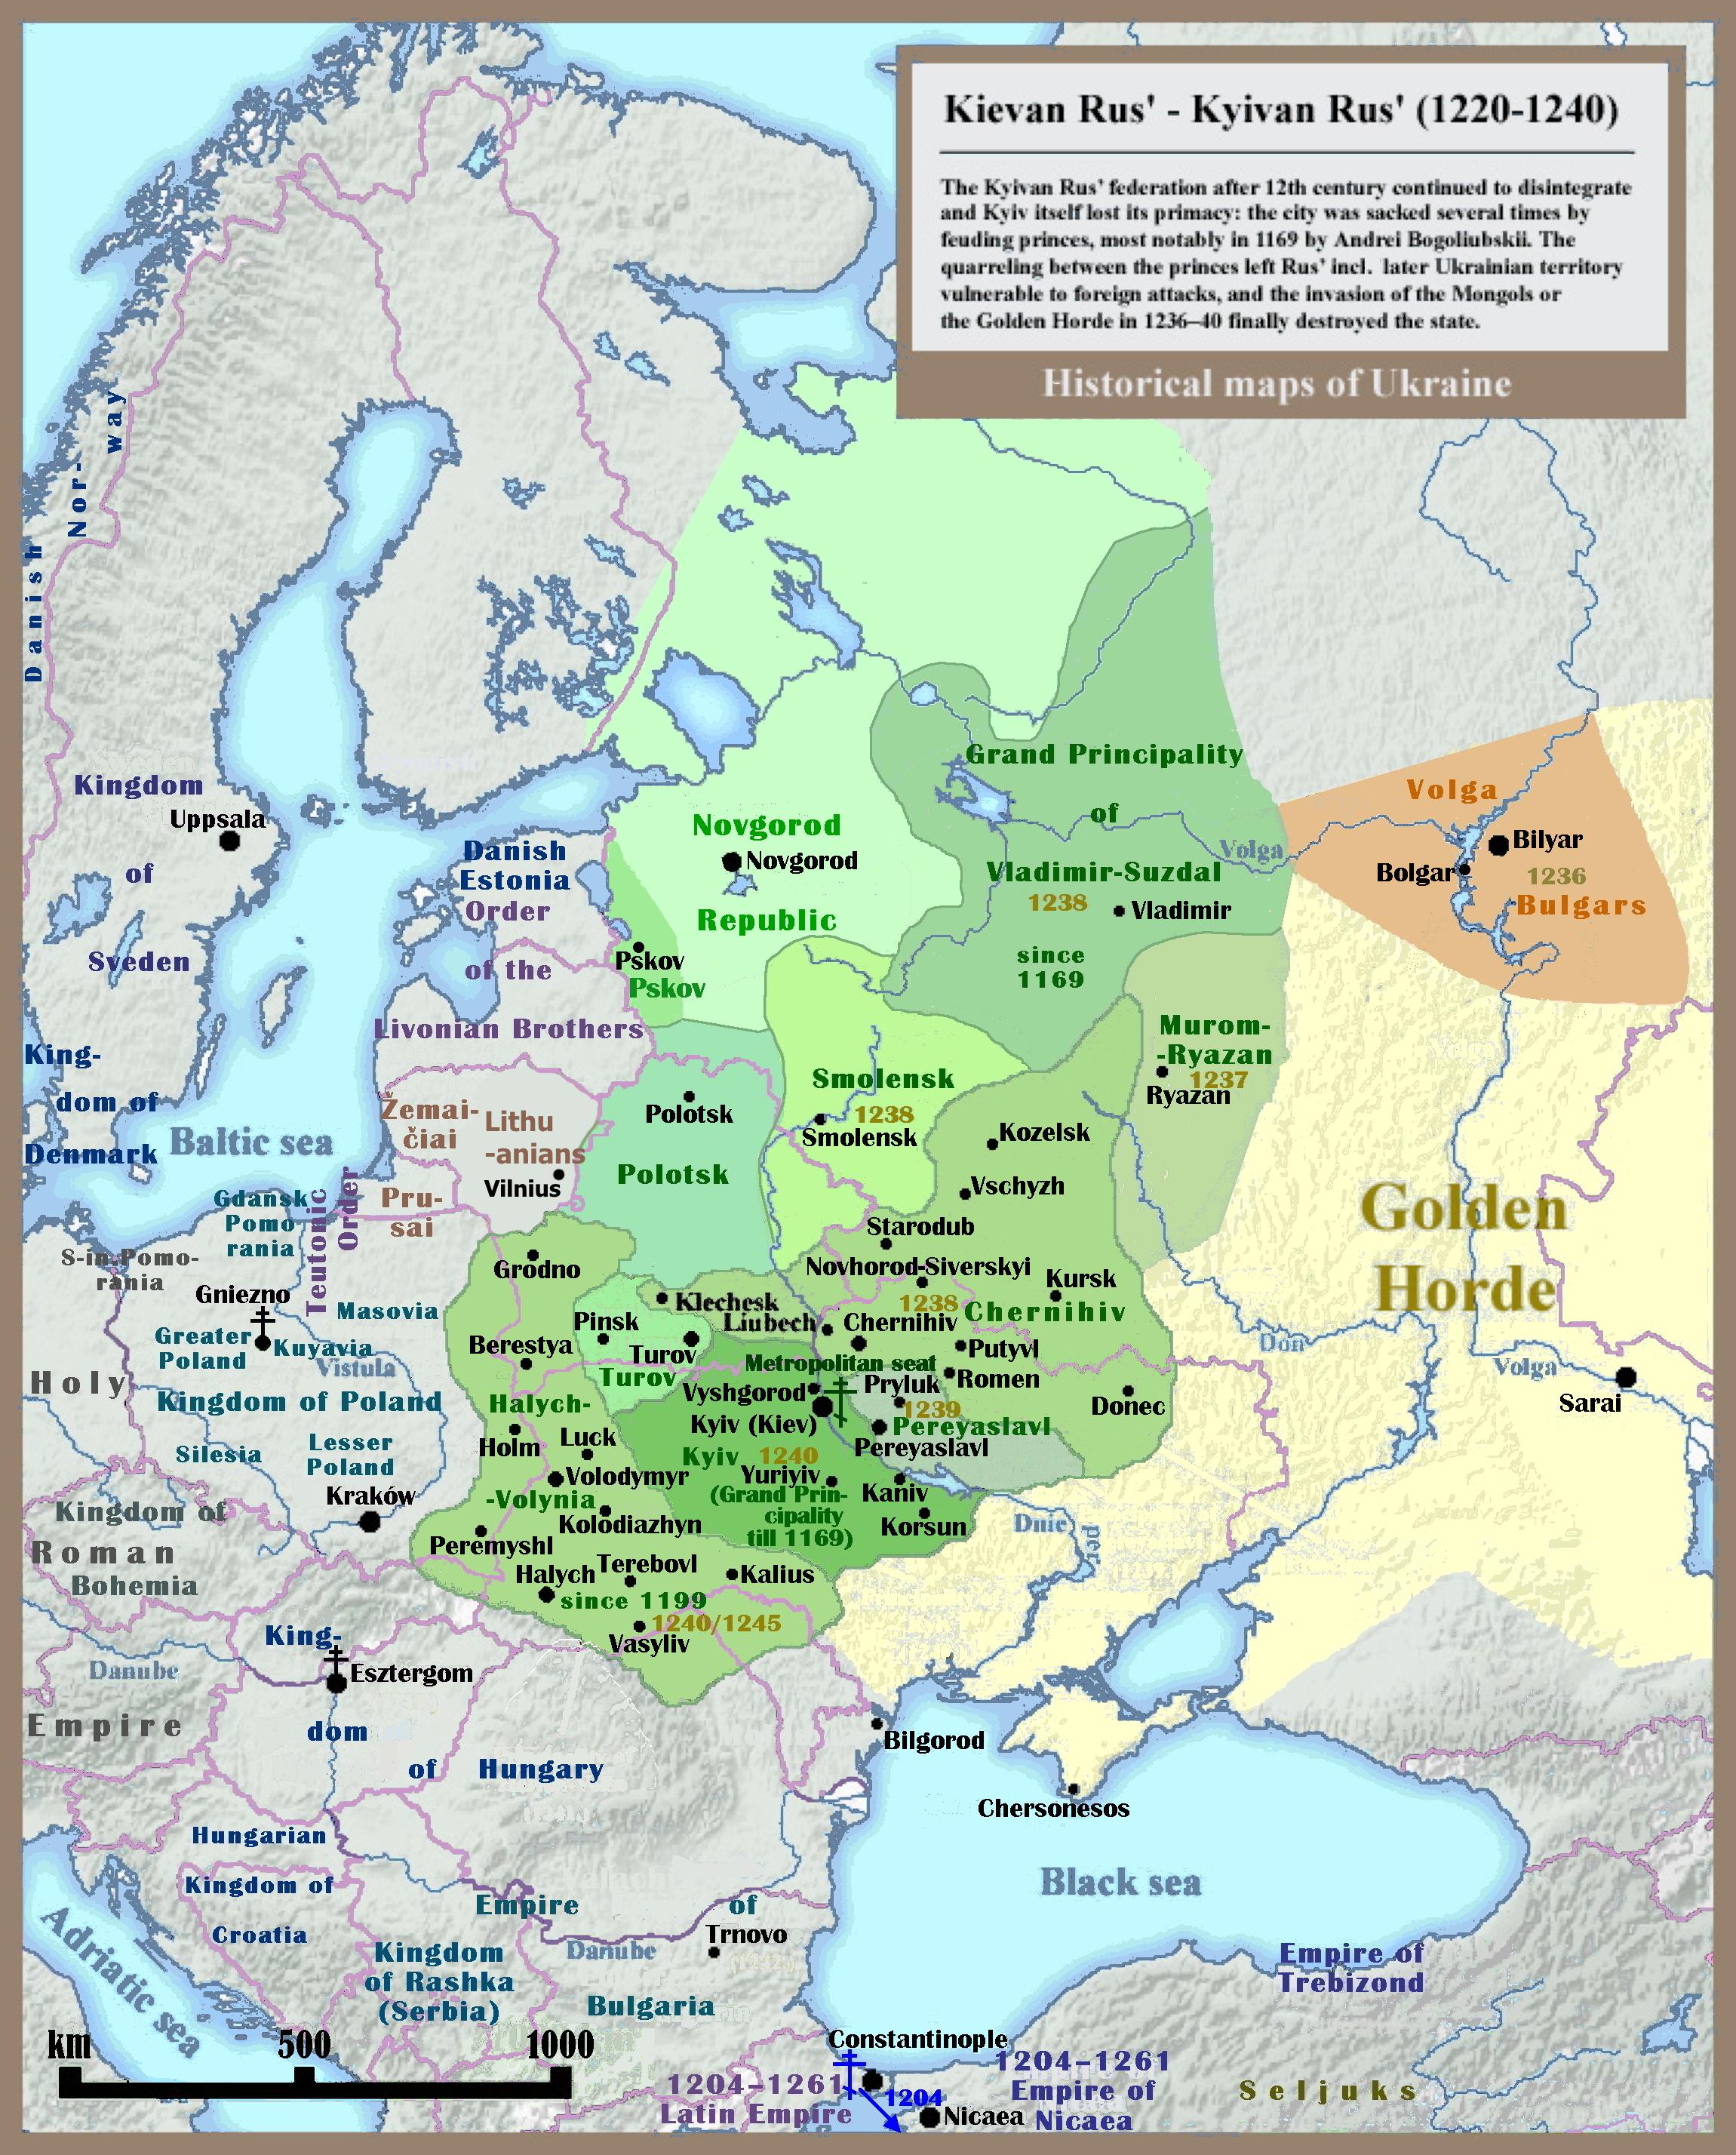 rincipalitiesofievanus,1220-1240.heseprincipalitiesincludedladimir-uzdal